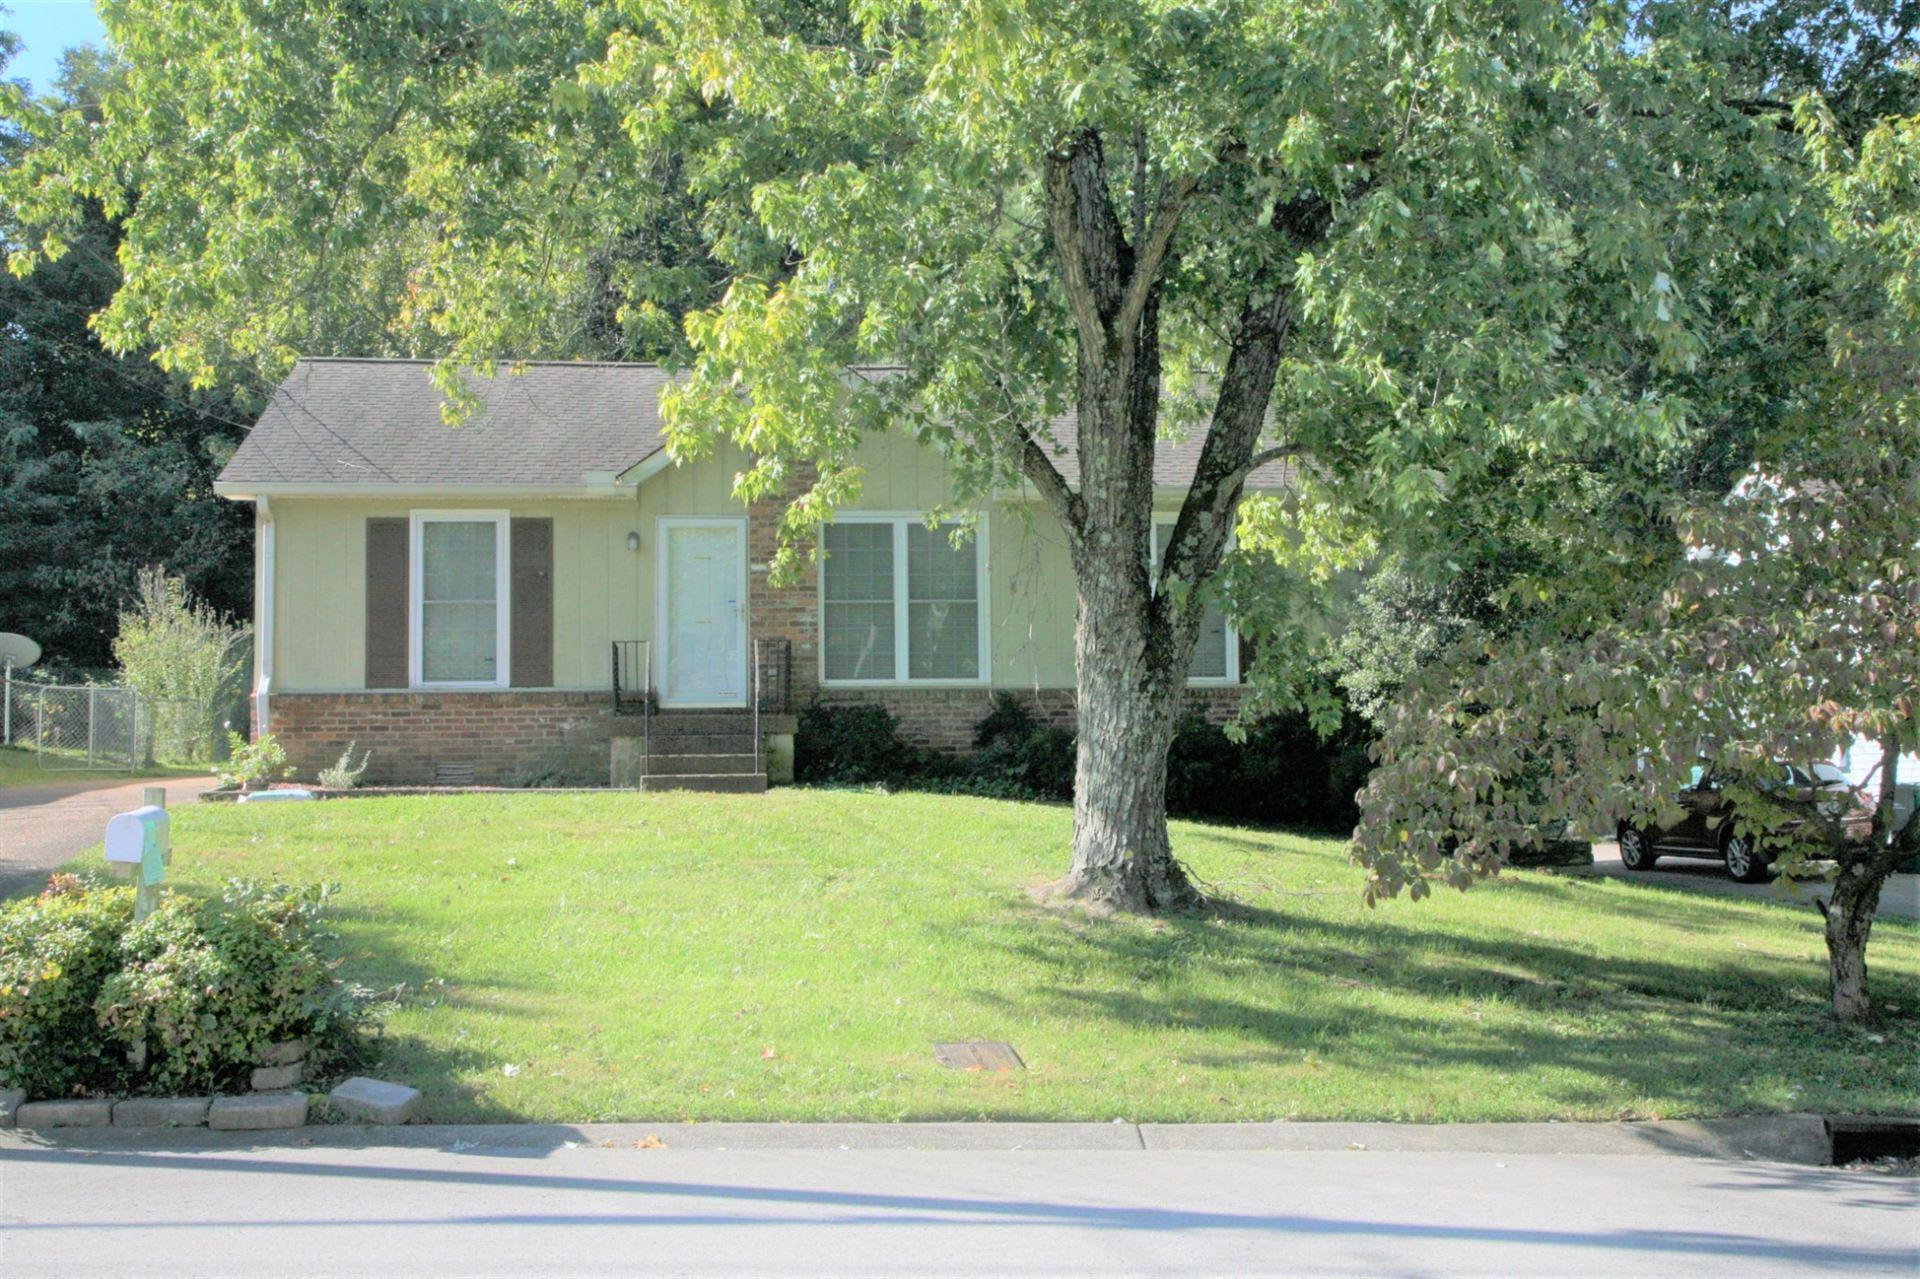 1040 Jacksons Valley Rd, Hermitage, TN 37076 - MLS#: 2301212